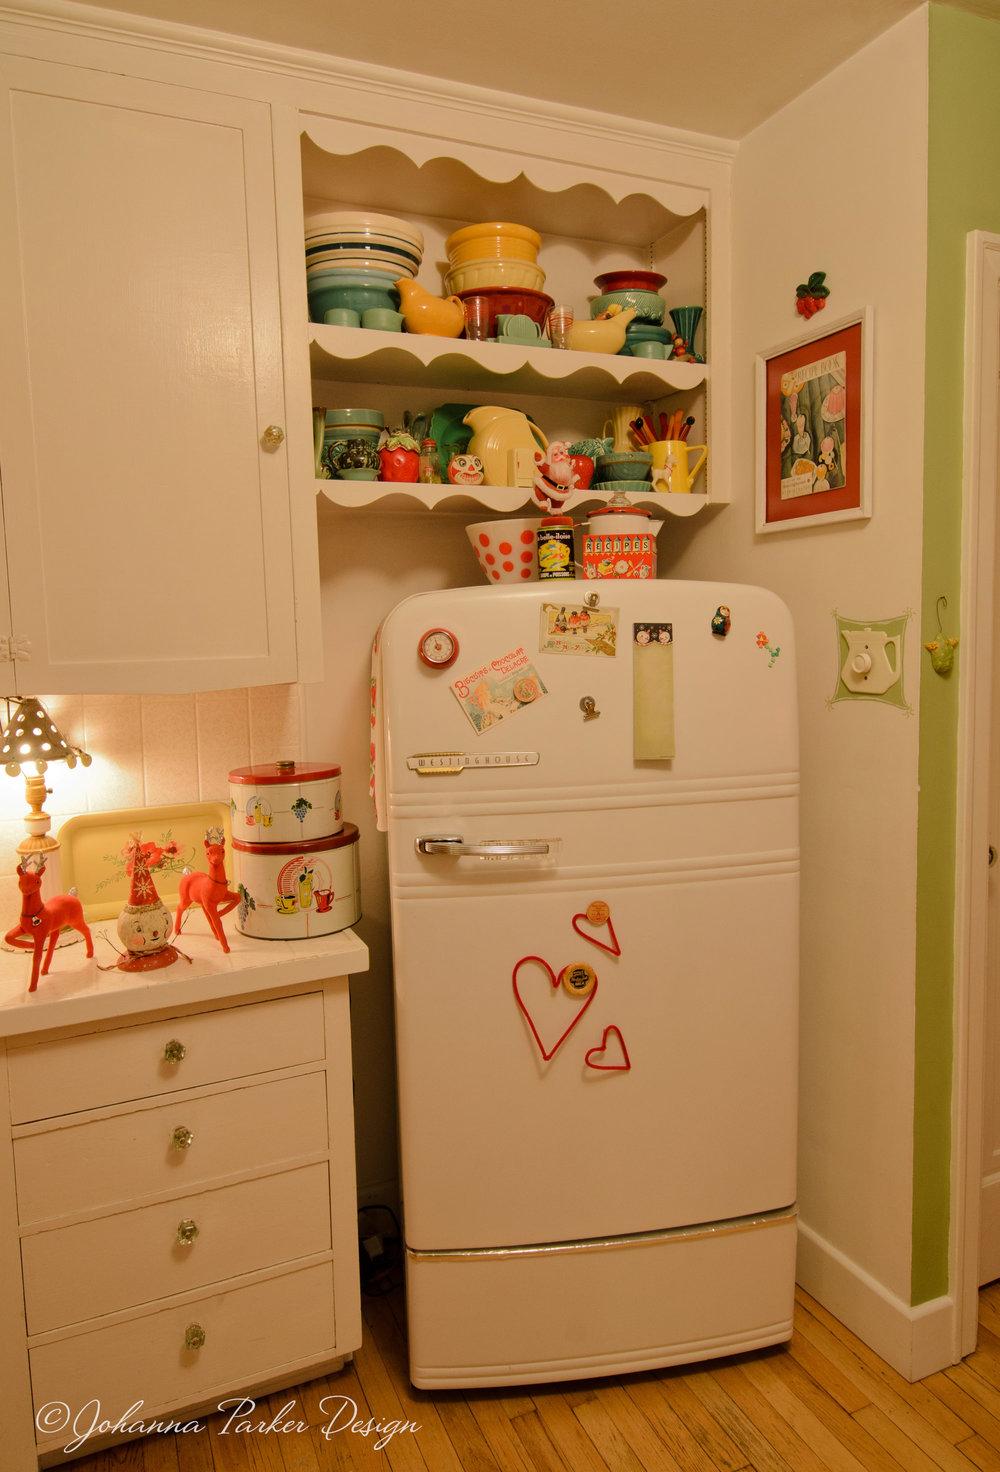 Vintage kitchen fridge